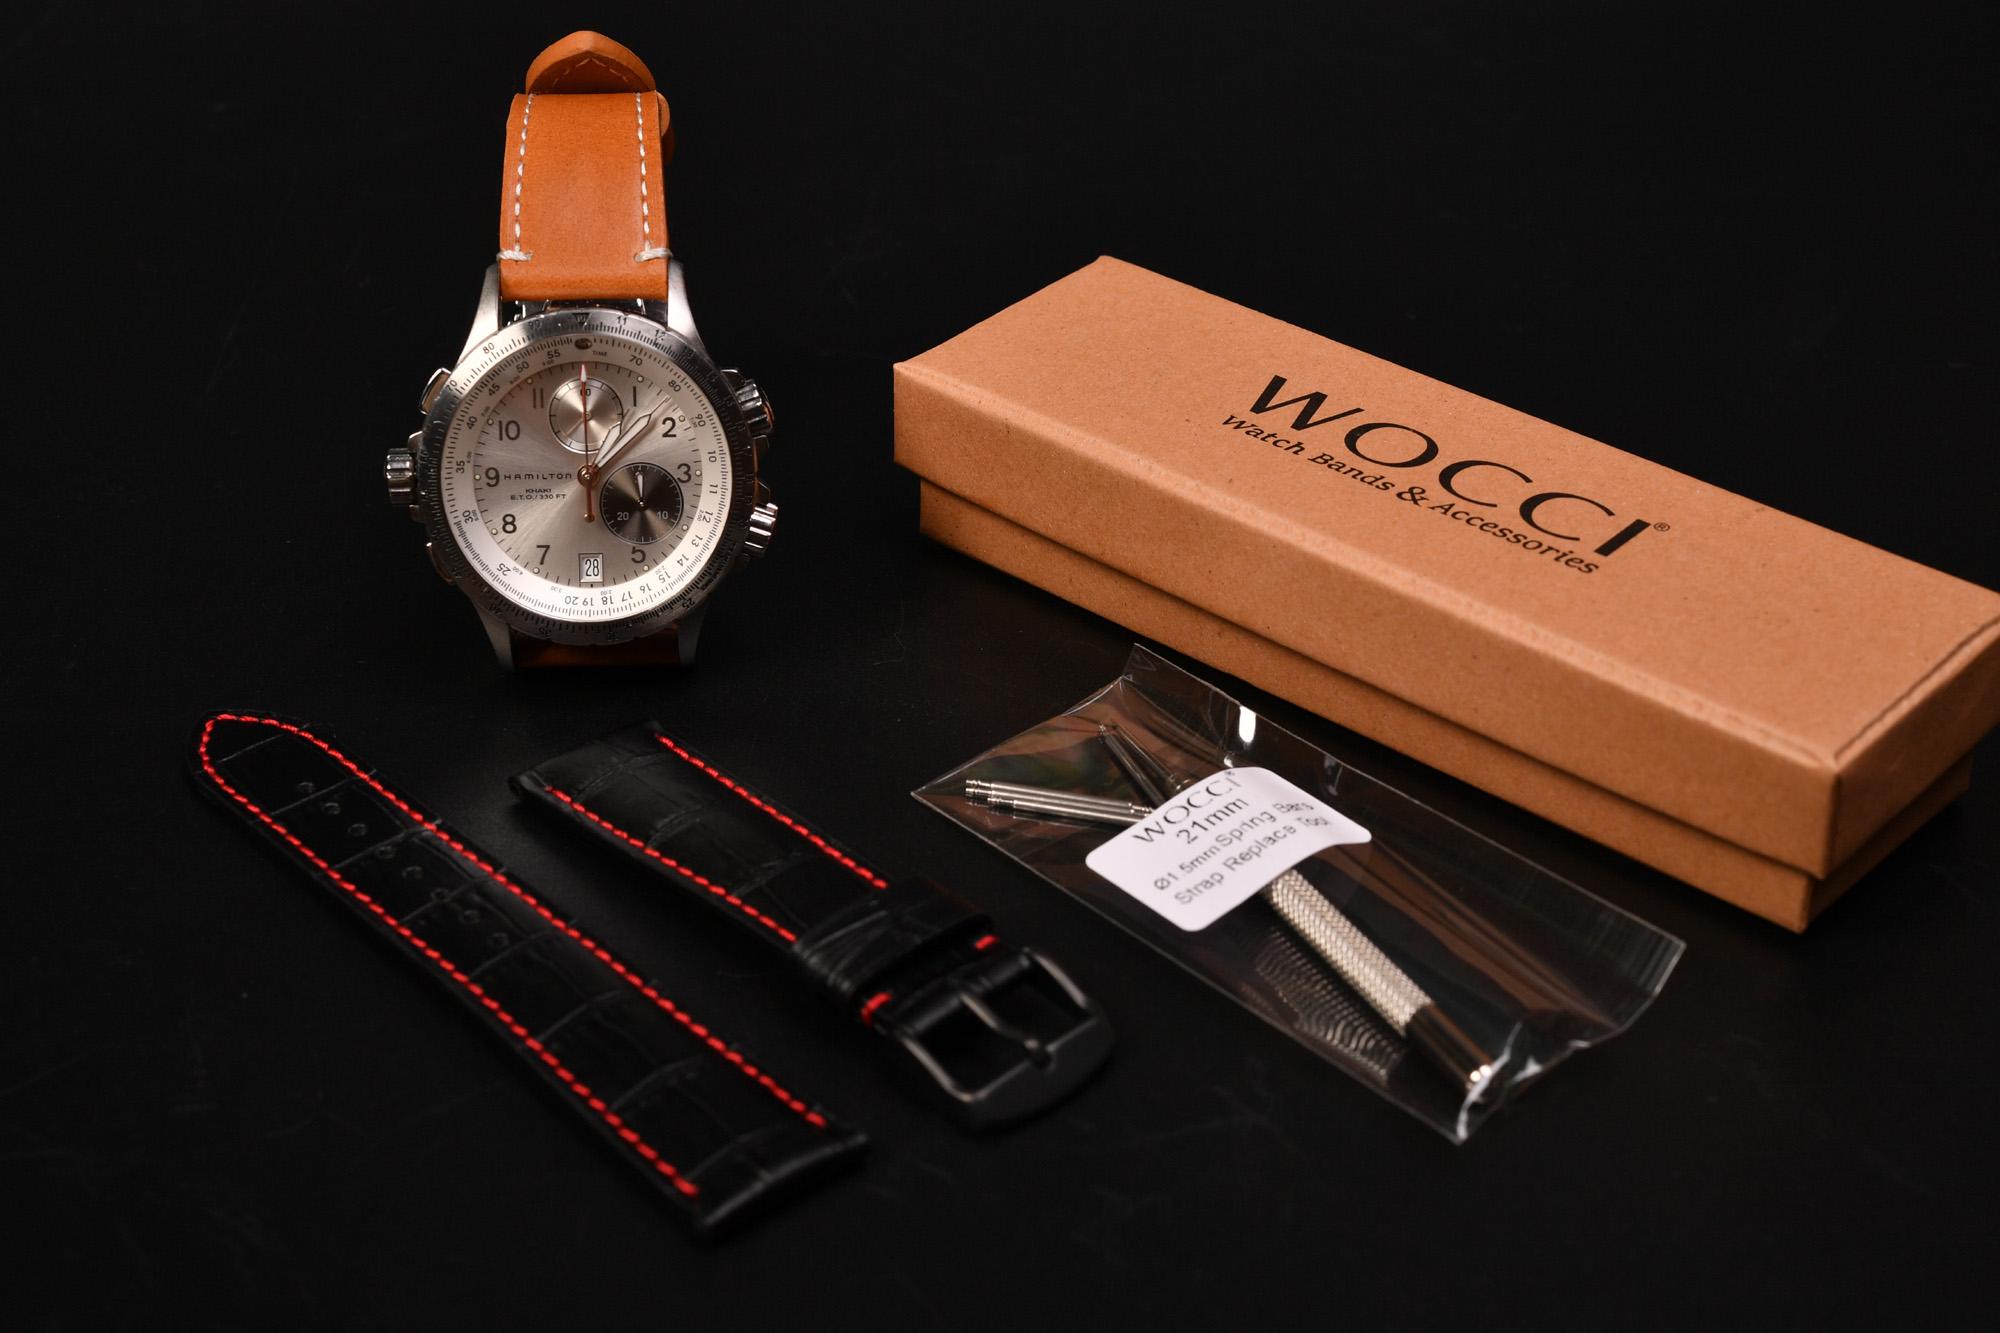 HAMILTON KHAKI E.T.O. H776220 またベルト交換しました。 DIY時計ベルト交換